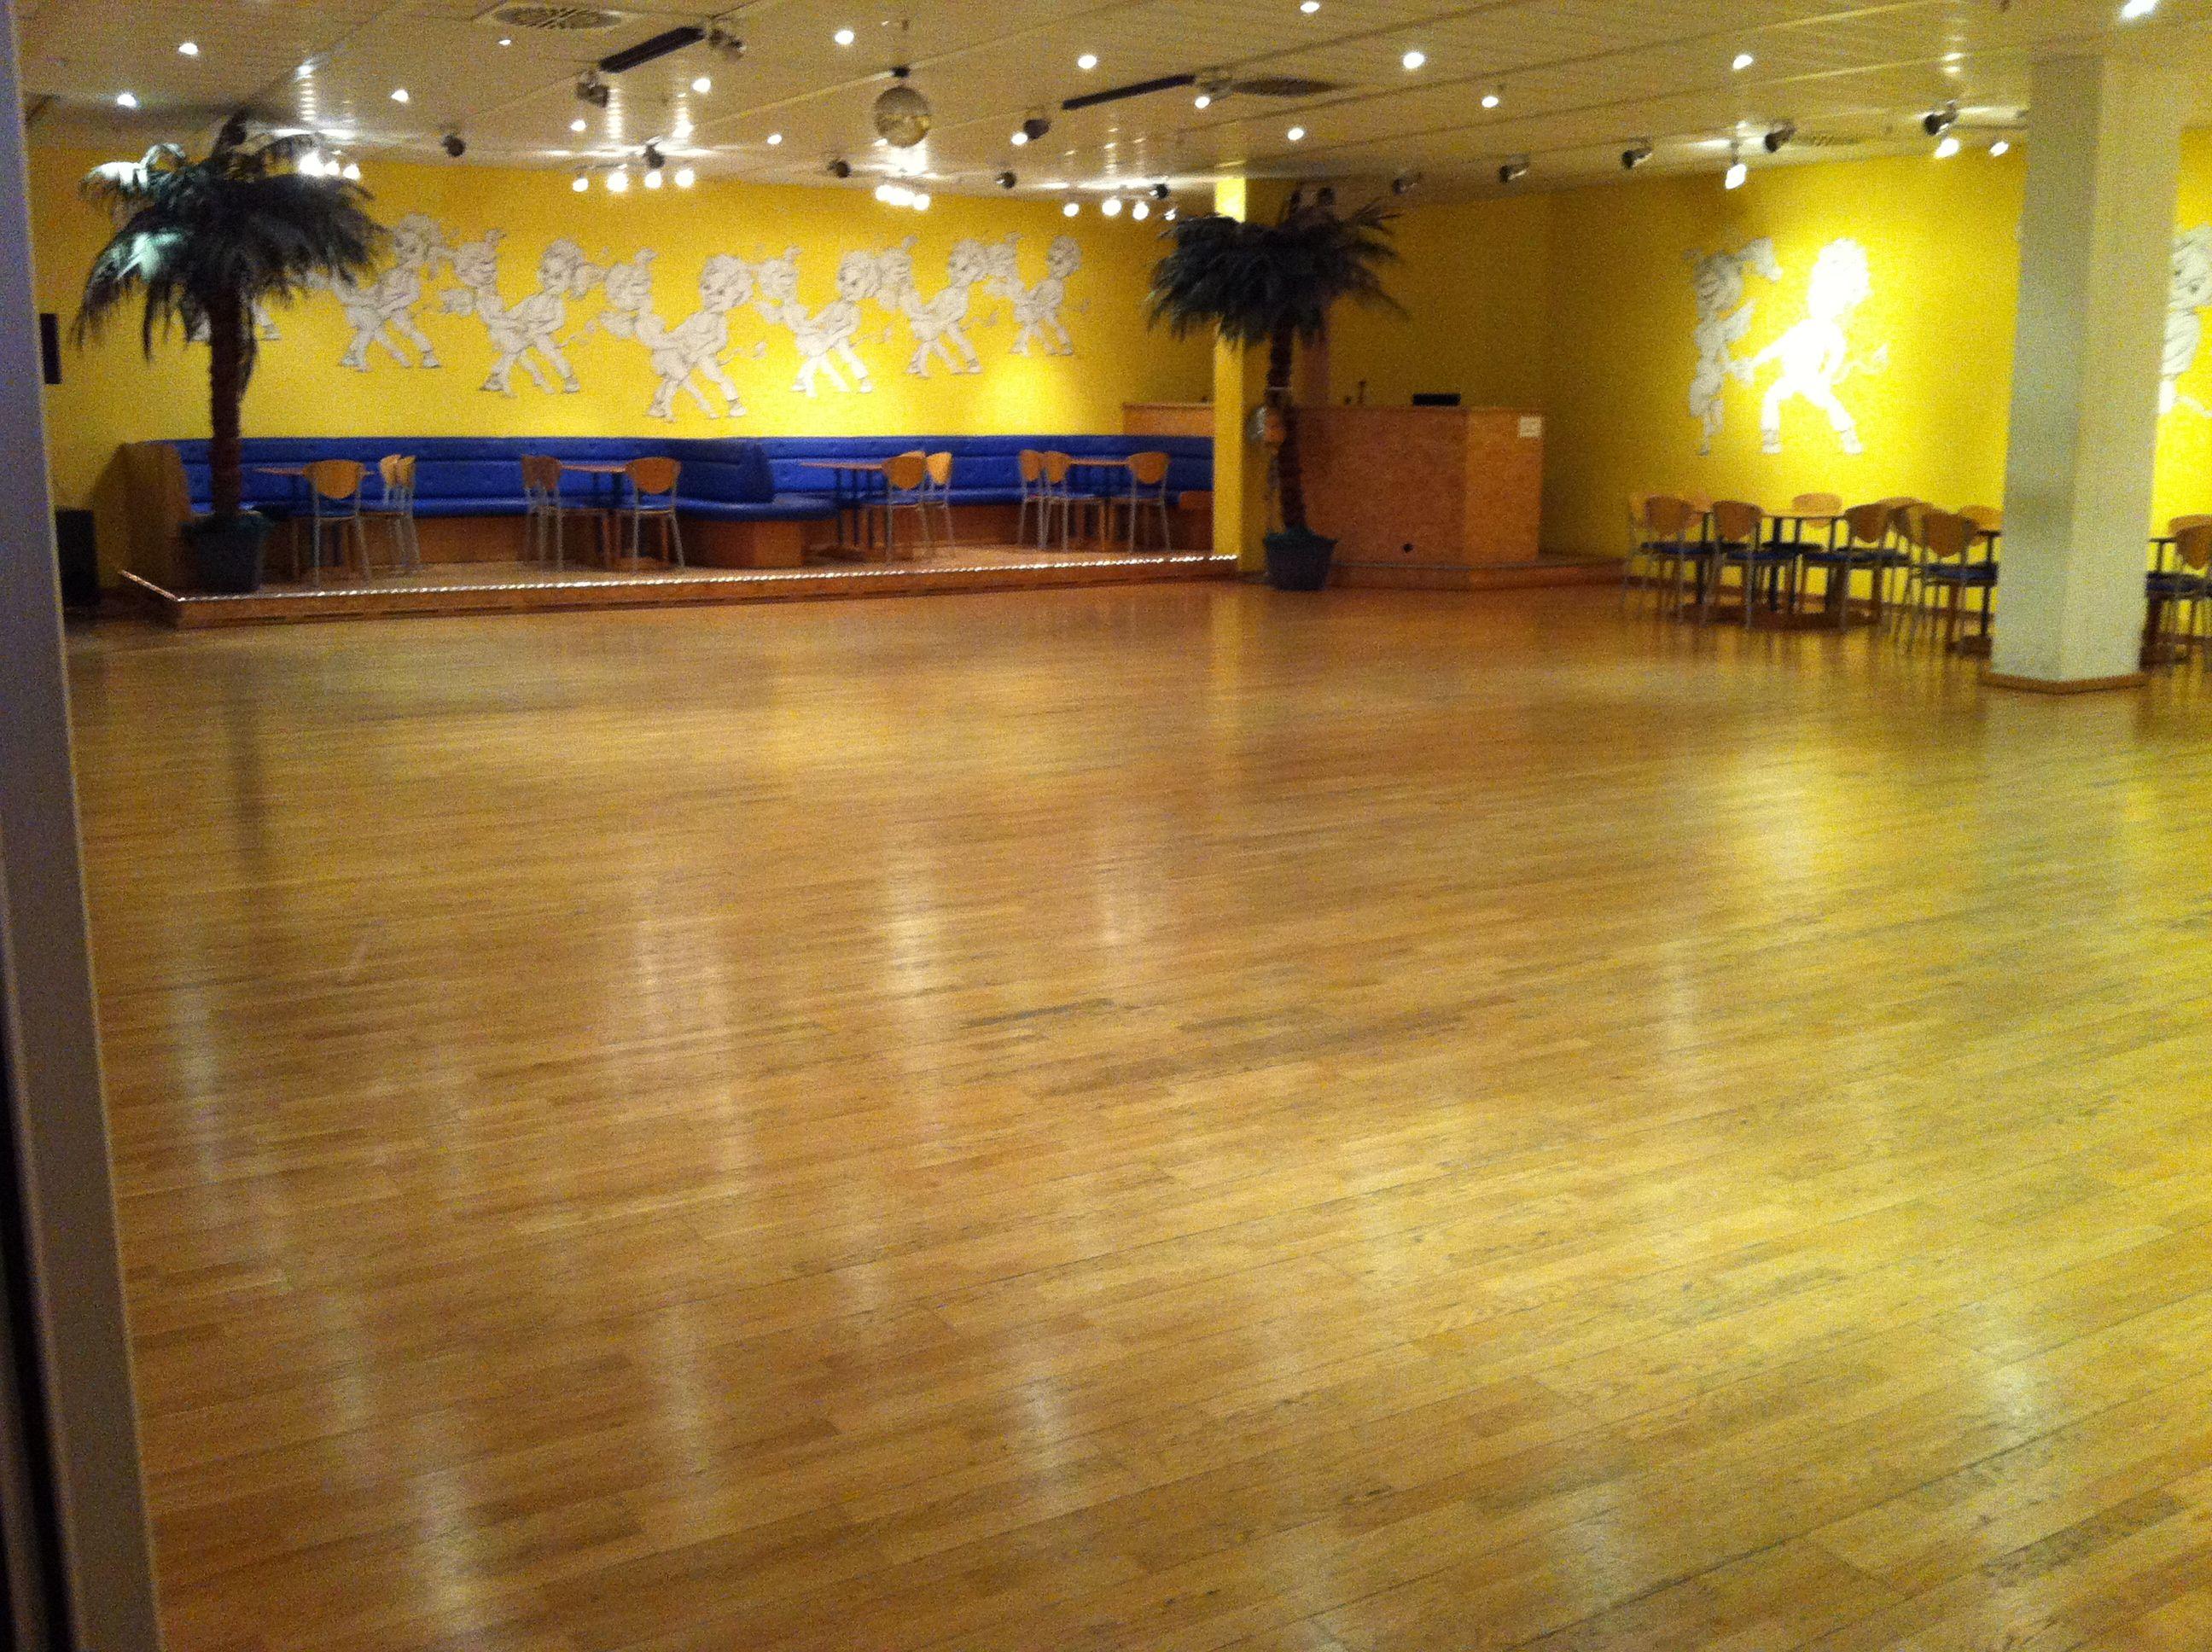 Parkett Rosenheim parkett renovierung tanzschule rosenheim mit bona sport 2kpu lack